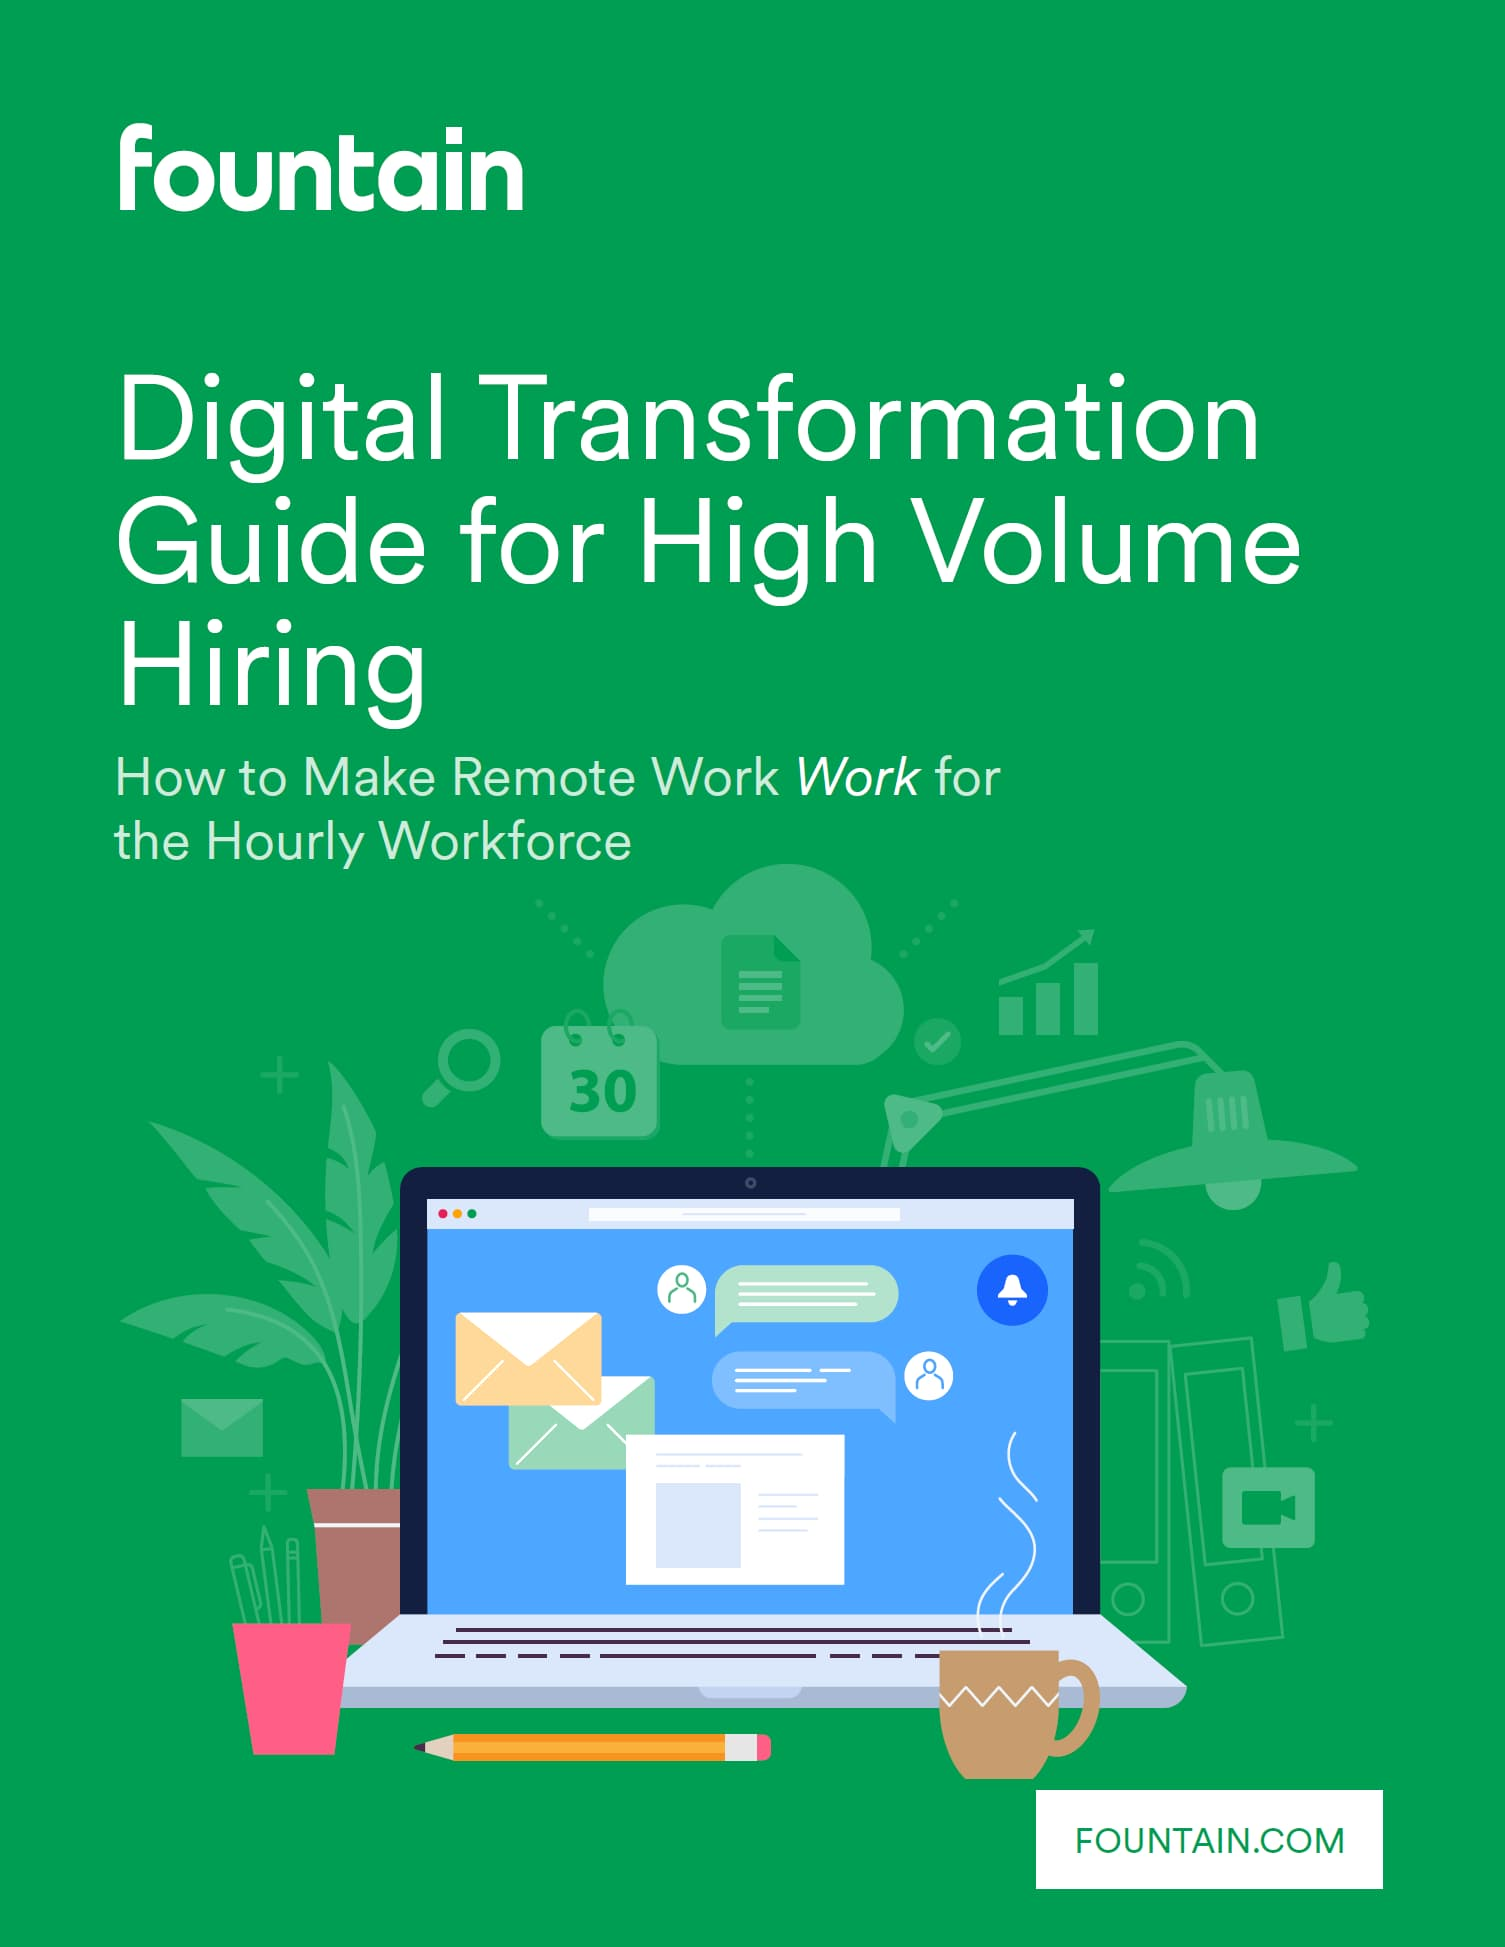 Digital Transformation Guide for High Volume Hiring